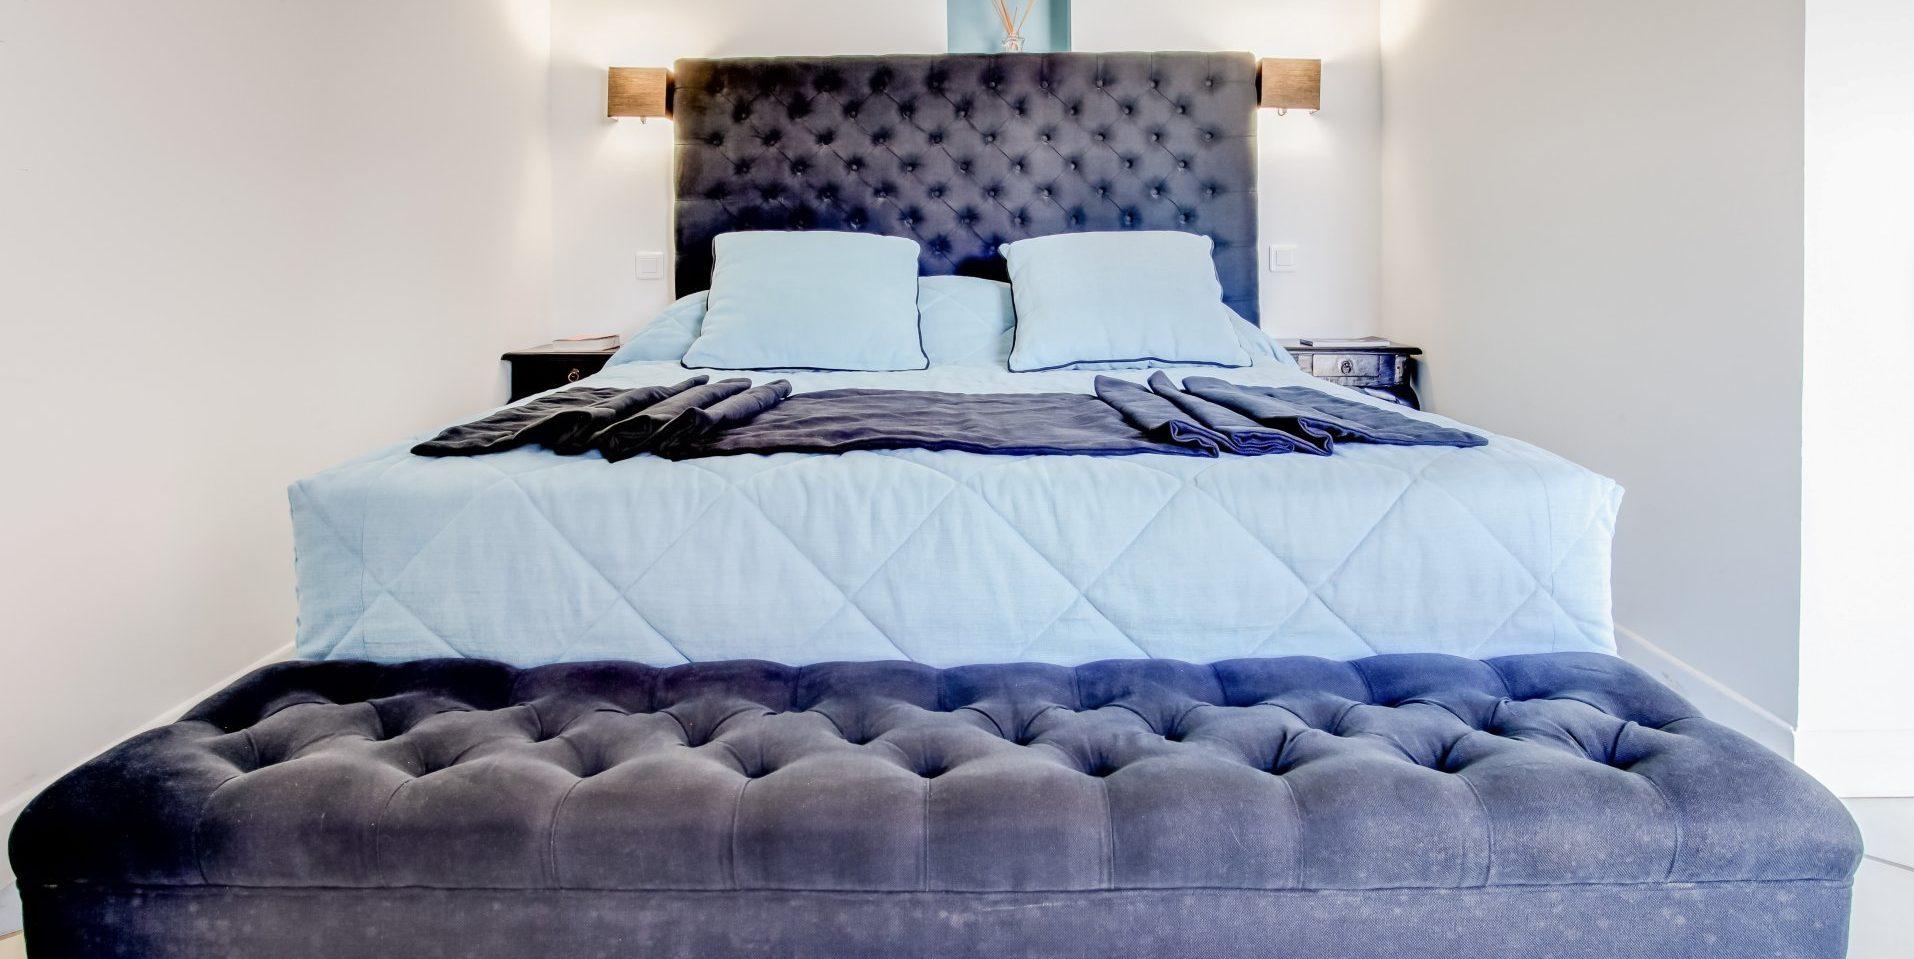 Hotel Le Roc E Fiori Porto-Vecchio Bocca del'Oro Corsica Frankrijk slaapkamer tweepersoonsbed sofa-op-wieltjes paars